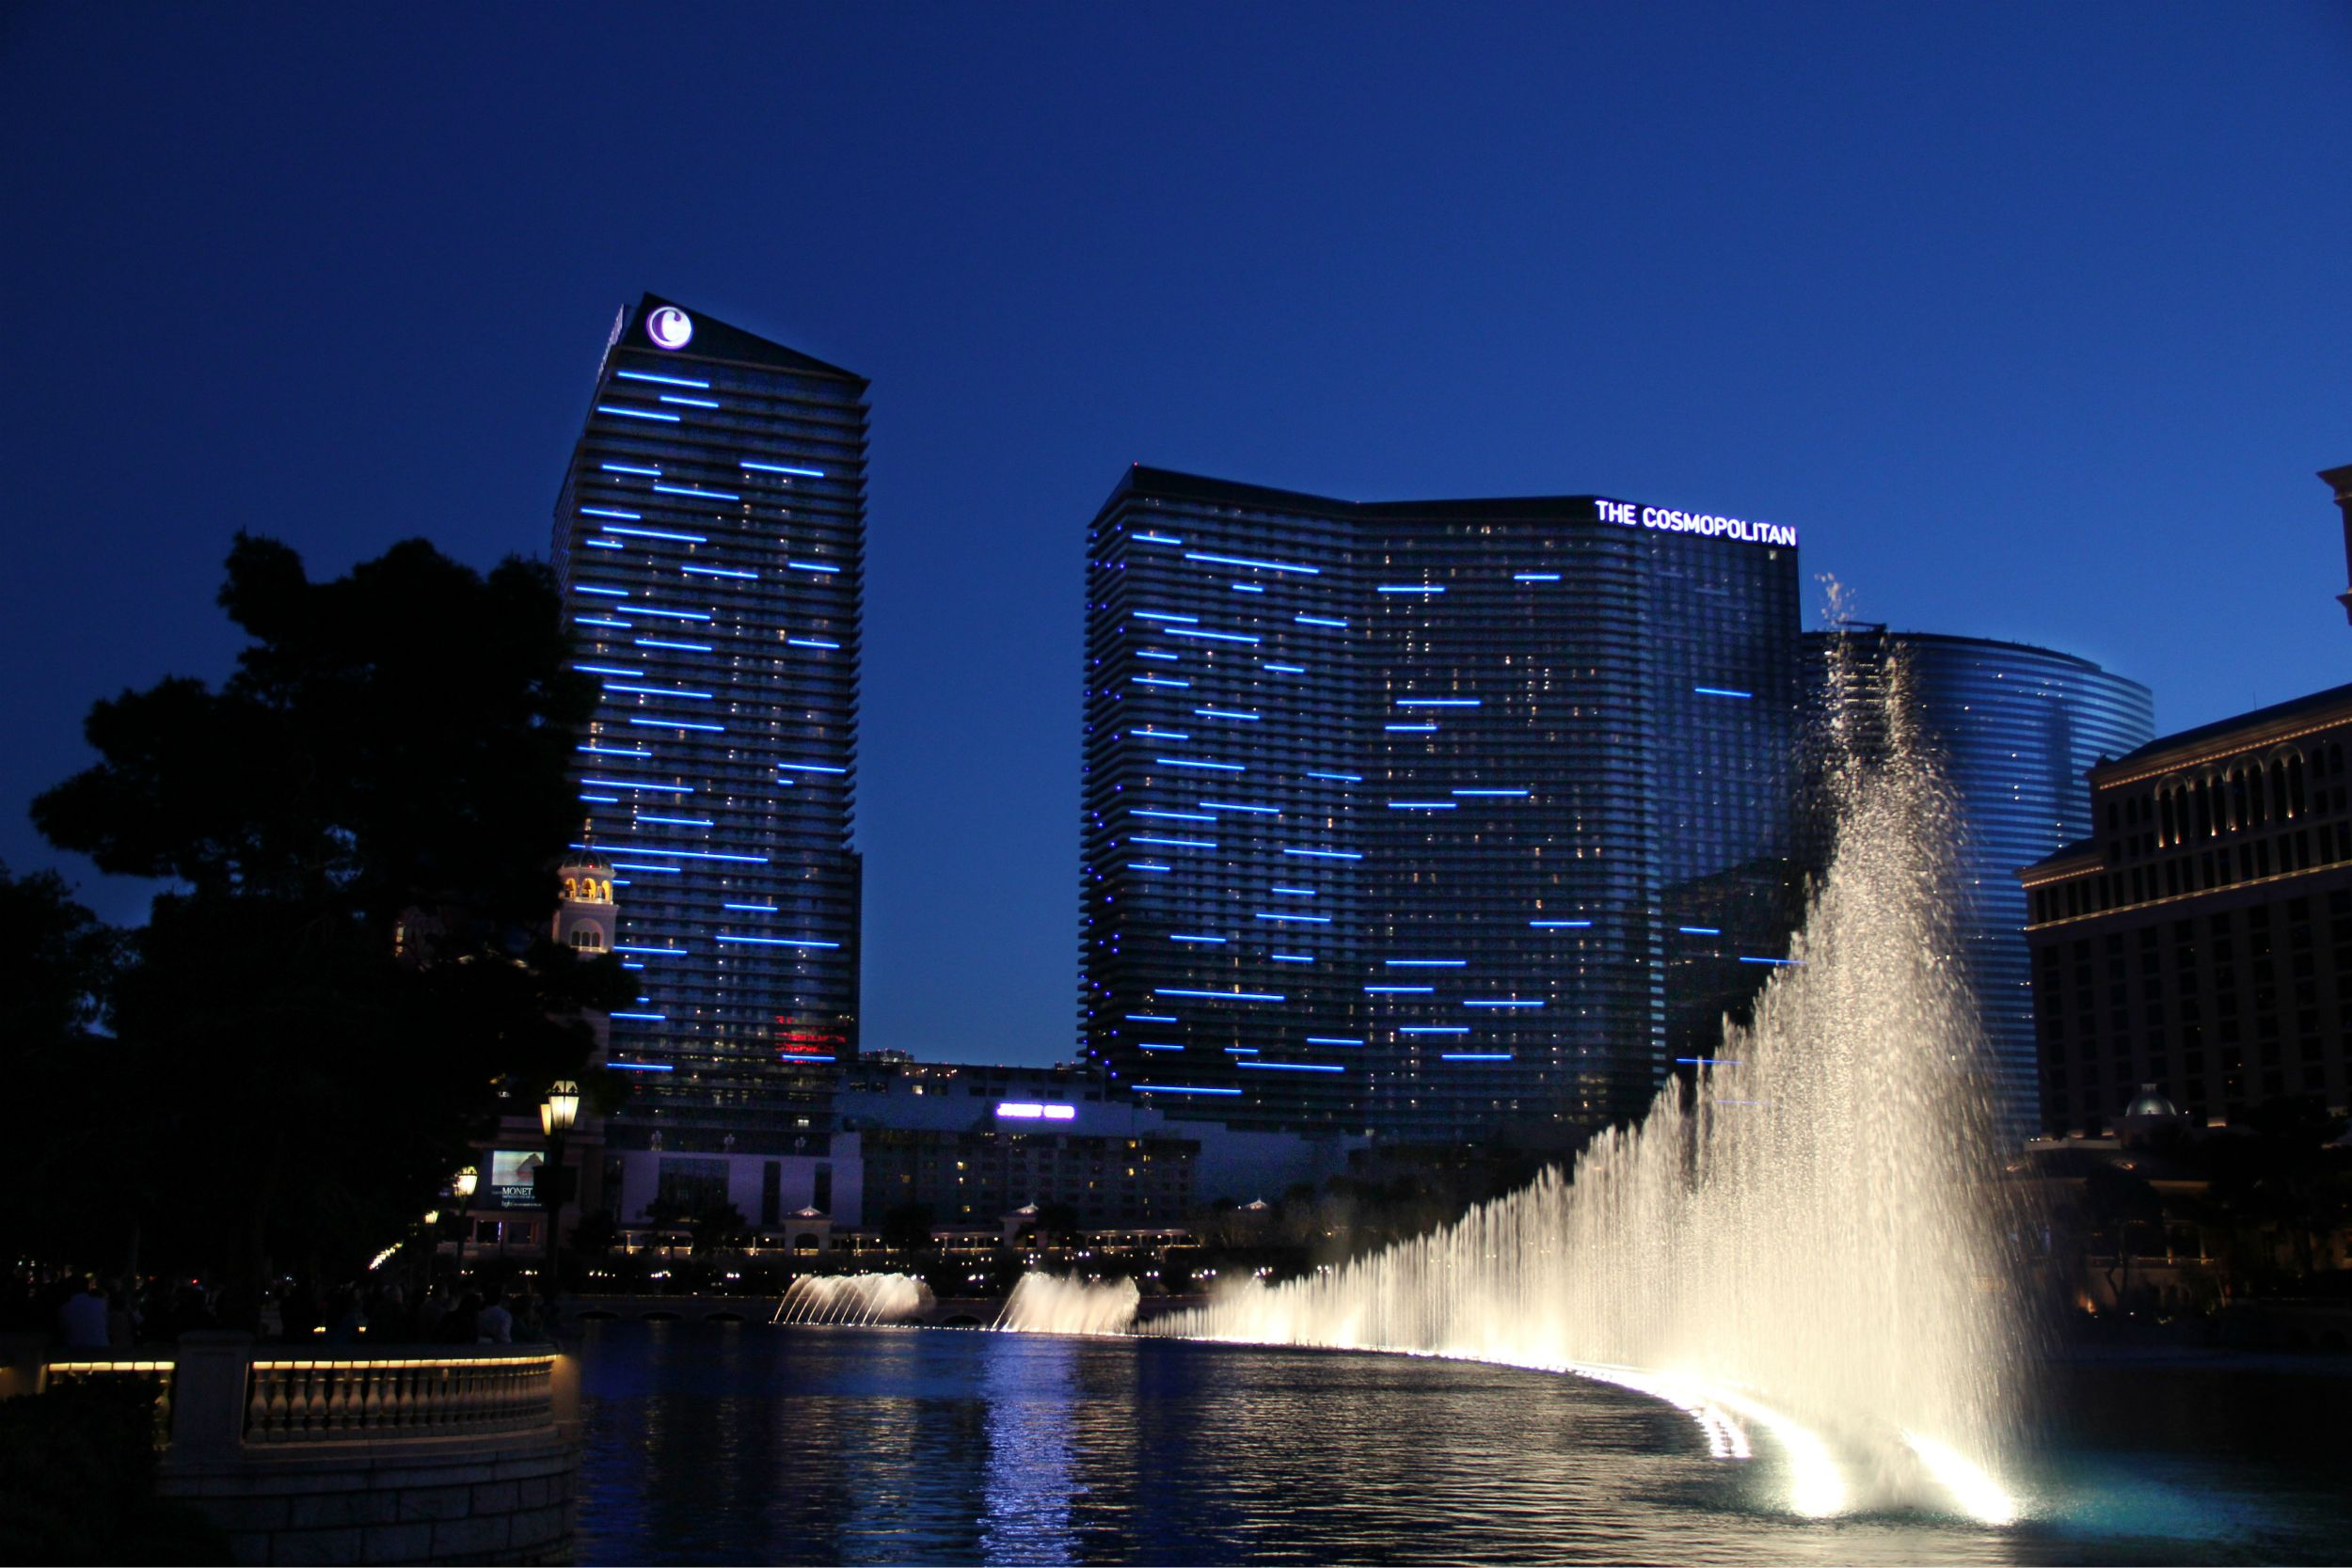 The Cosmopolitan - Las Vegas